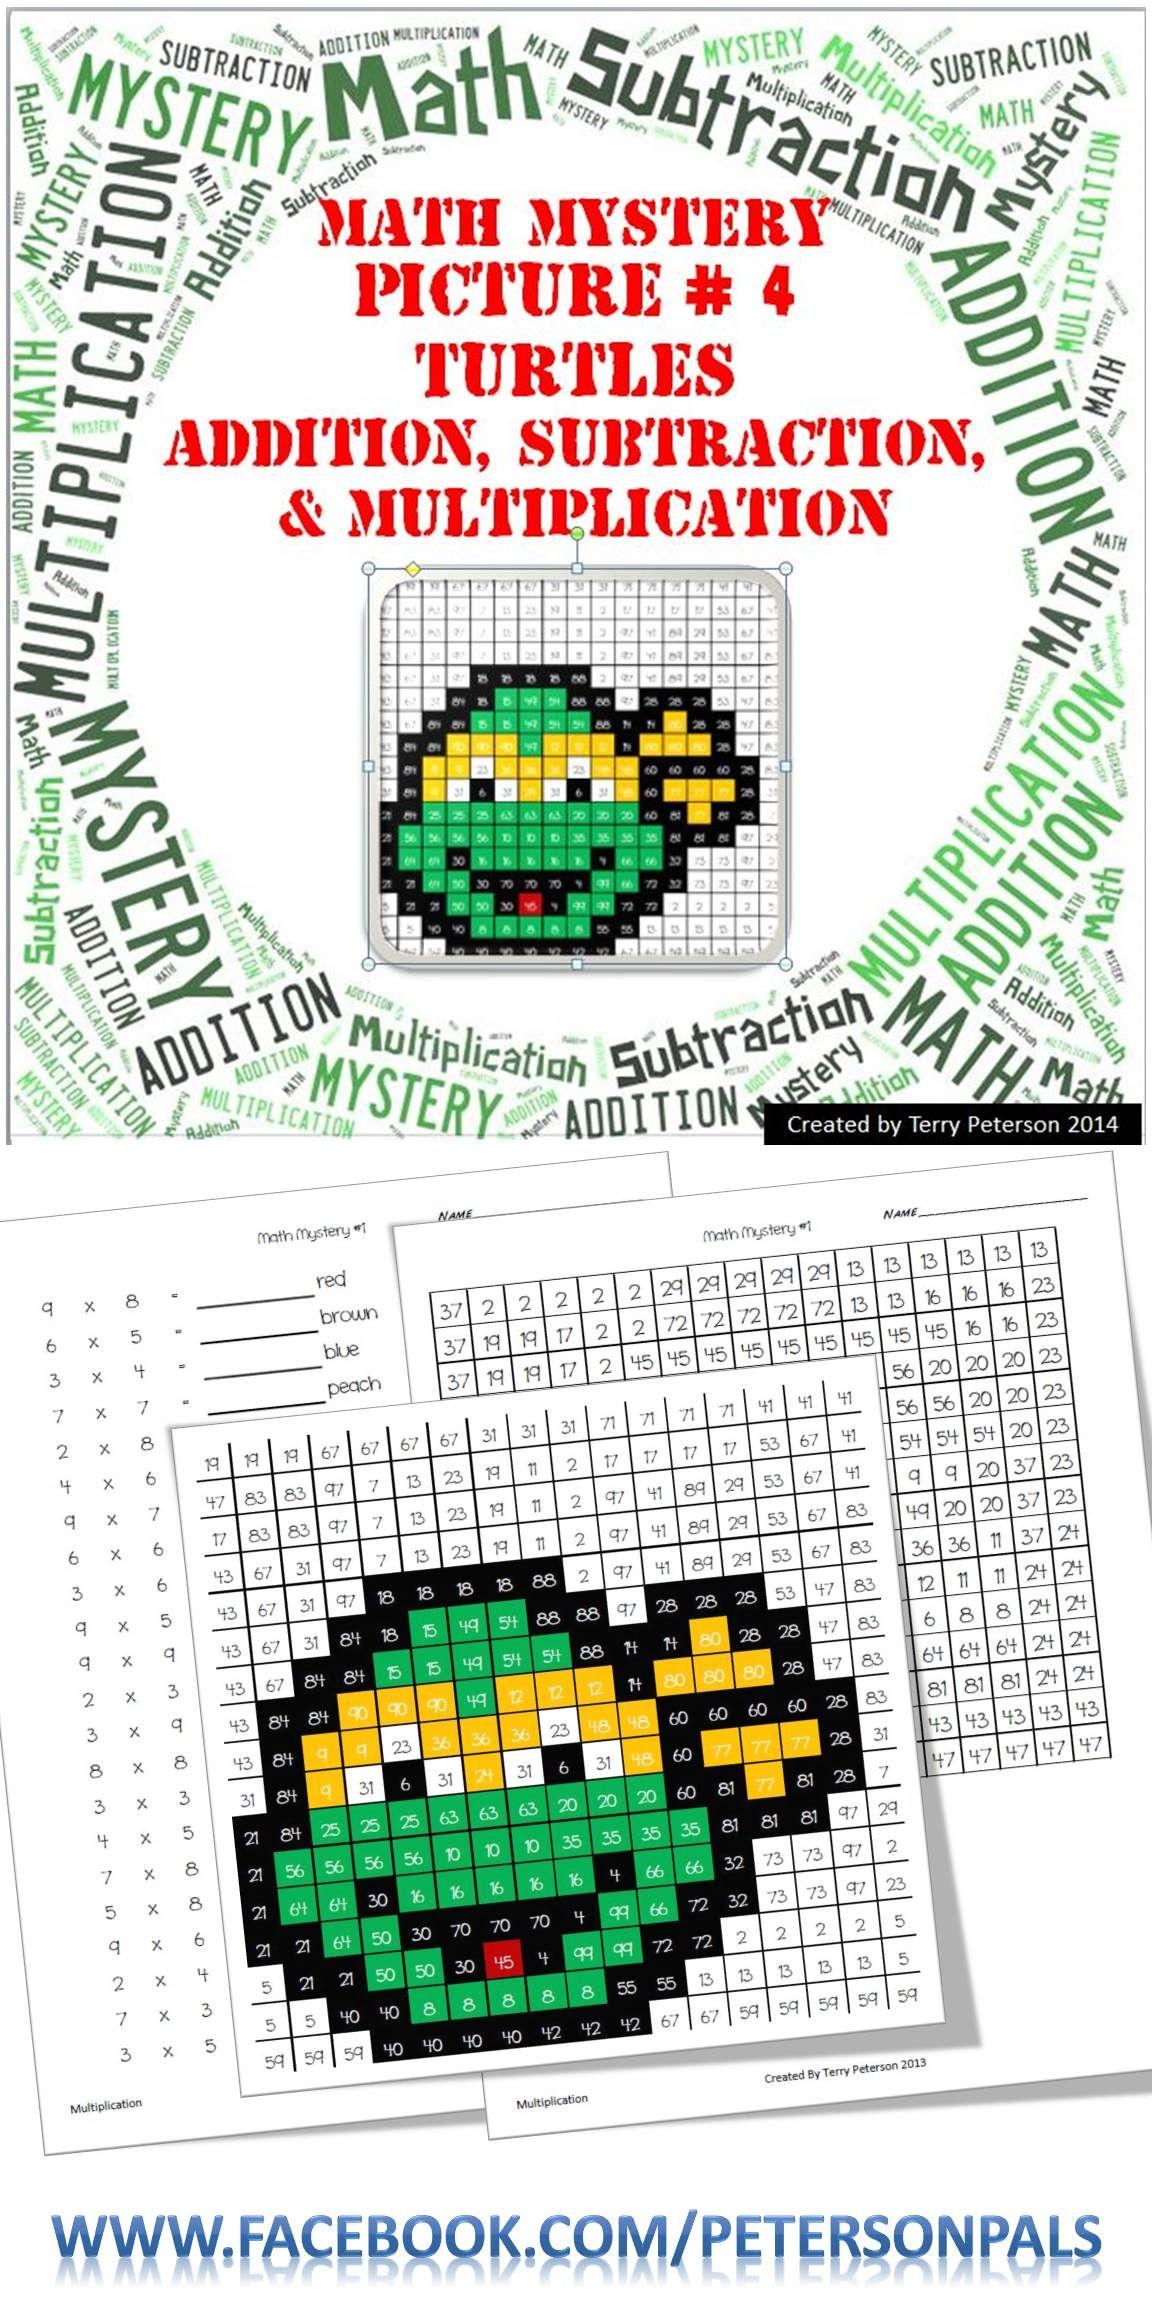 Ninja Turtles Math Mystery Picture 4 Addition